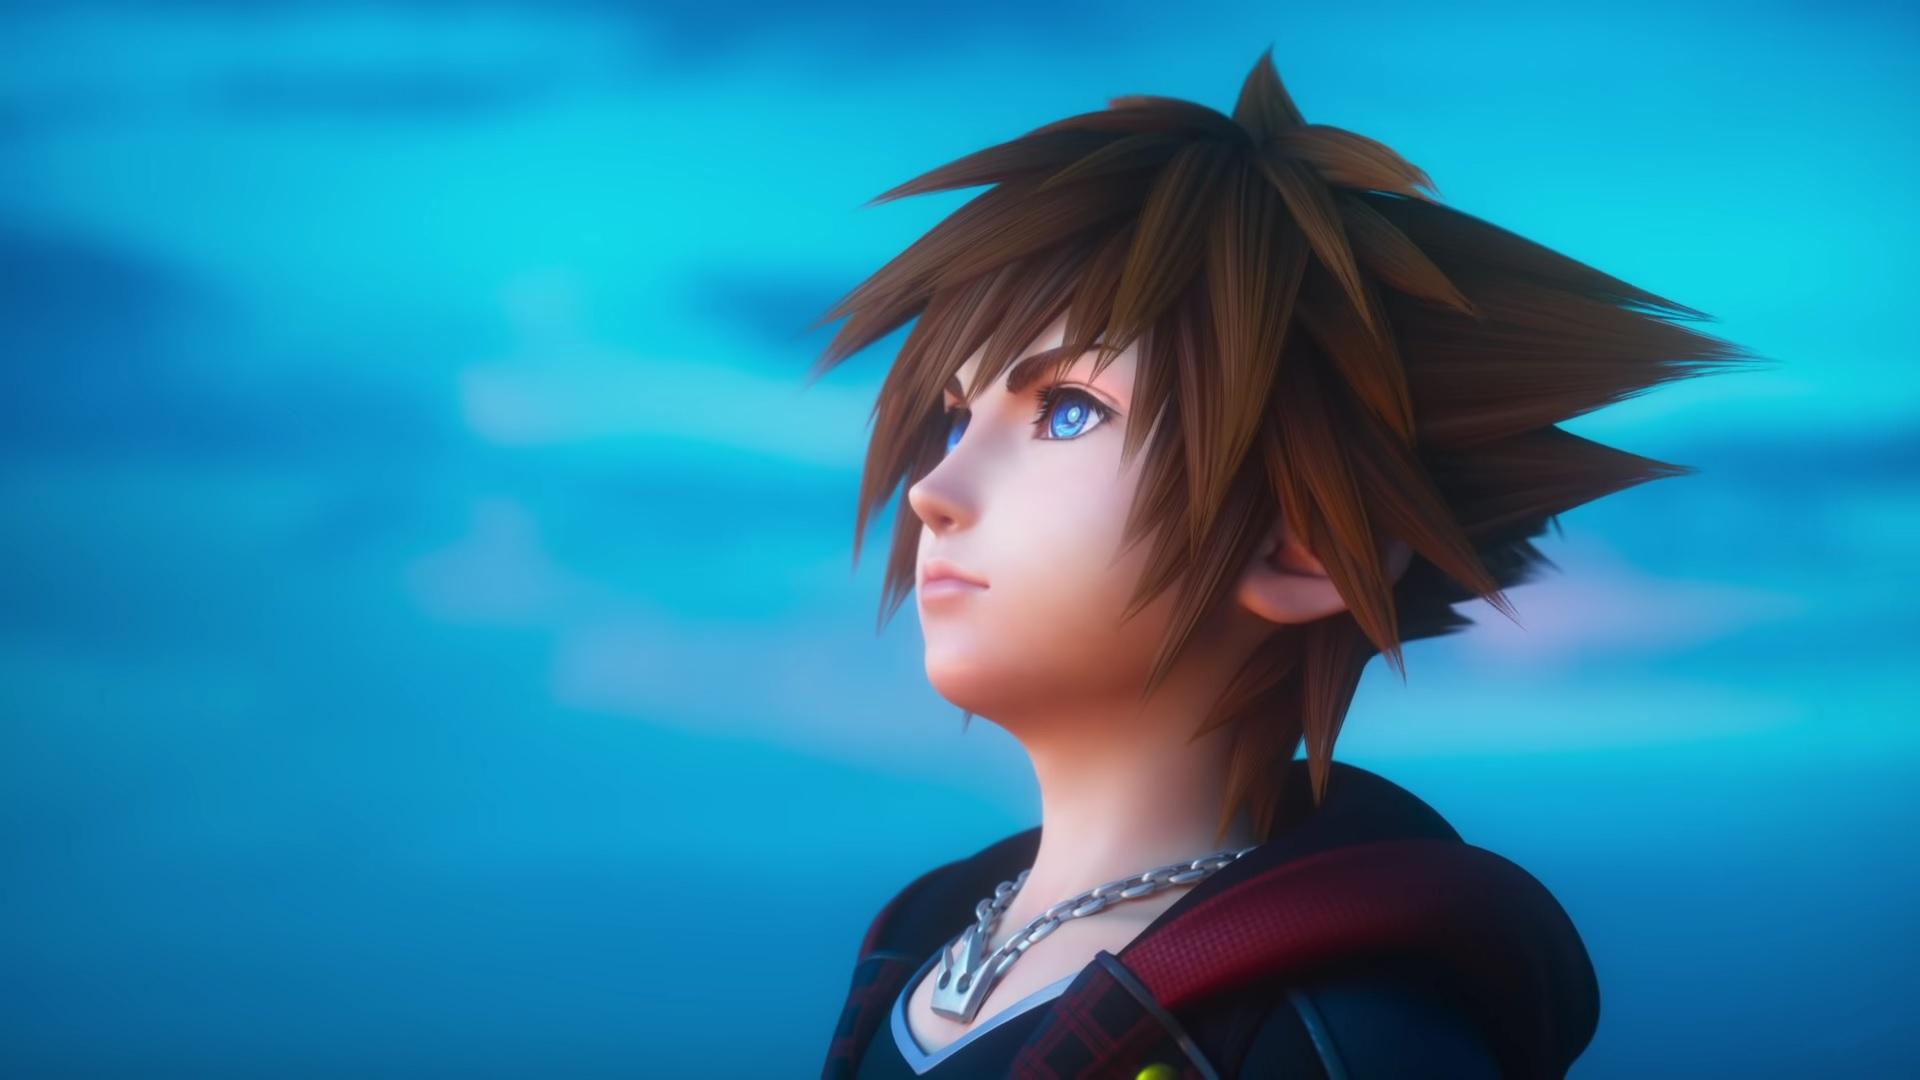 Sora Kingdom Hearts Iii Opening Hd Wallpaper Background Image